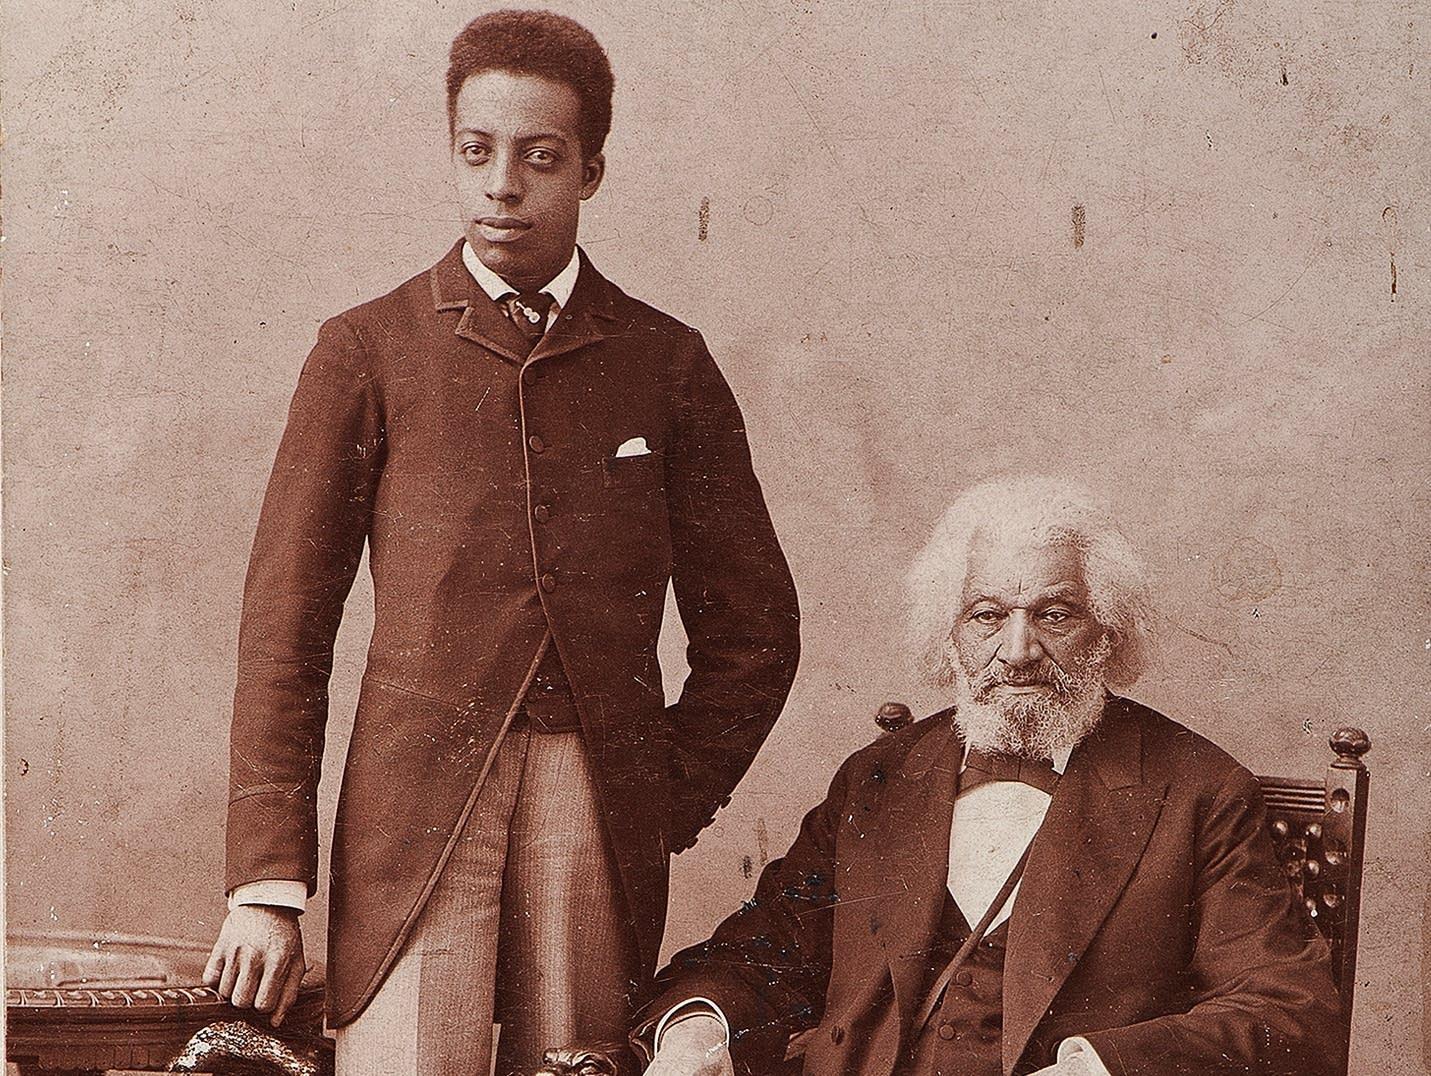 Joseph and Frederick Douglass